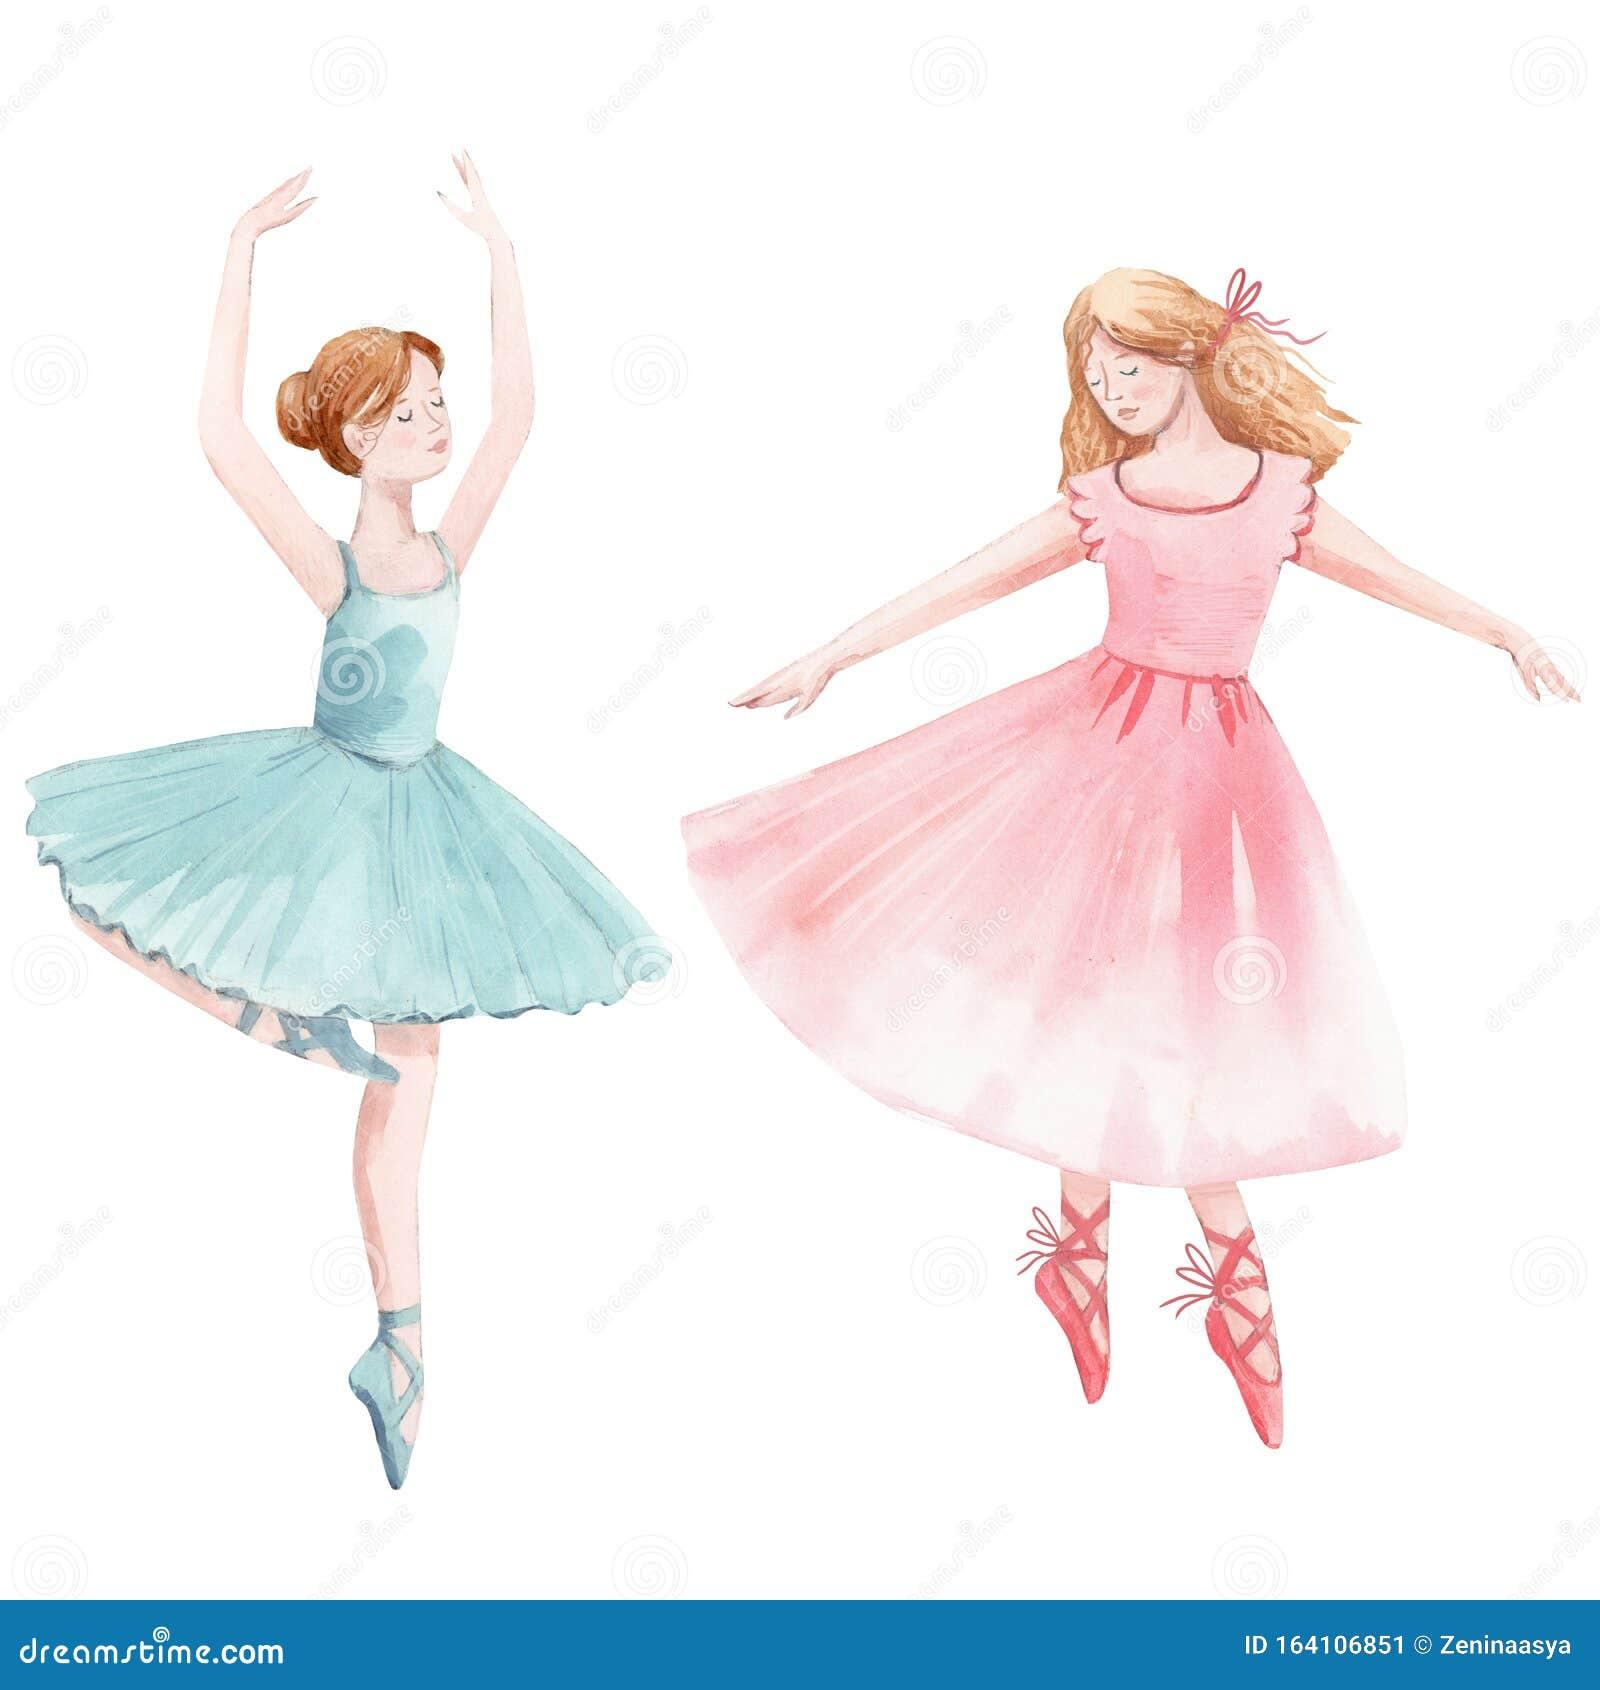 A Groovy Woman Doing The Shuffle Dance   Short sleeve jacket, Women, Groovy